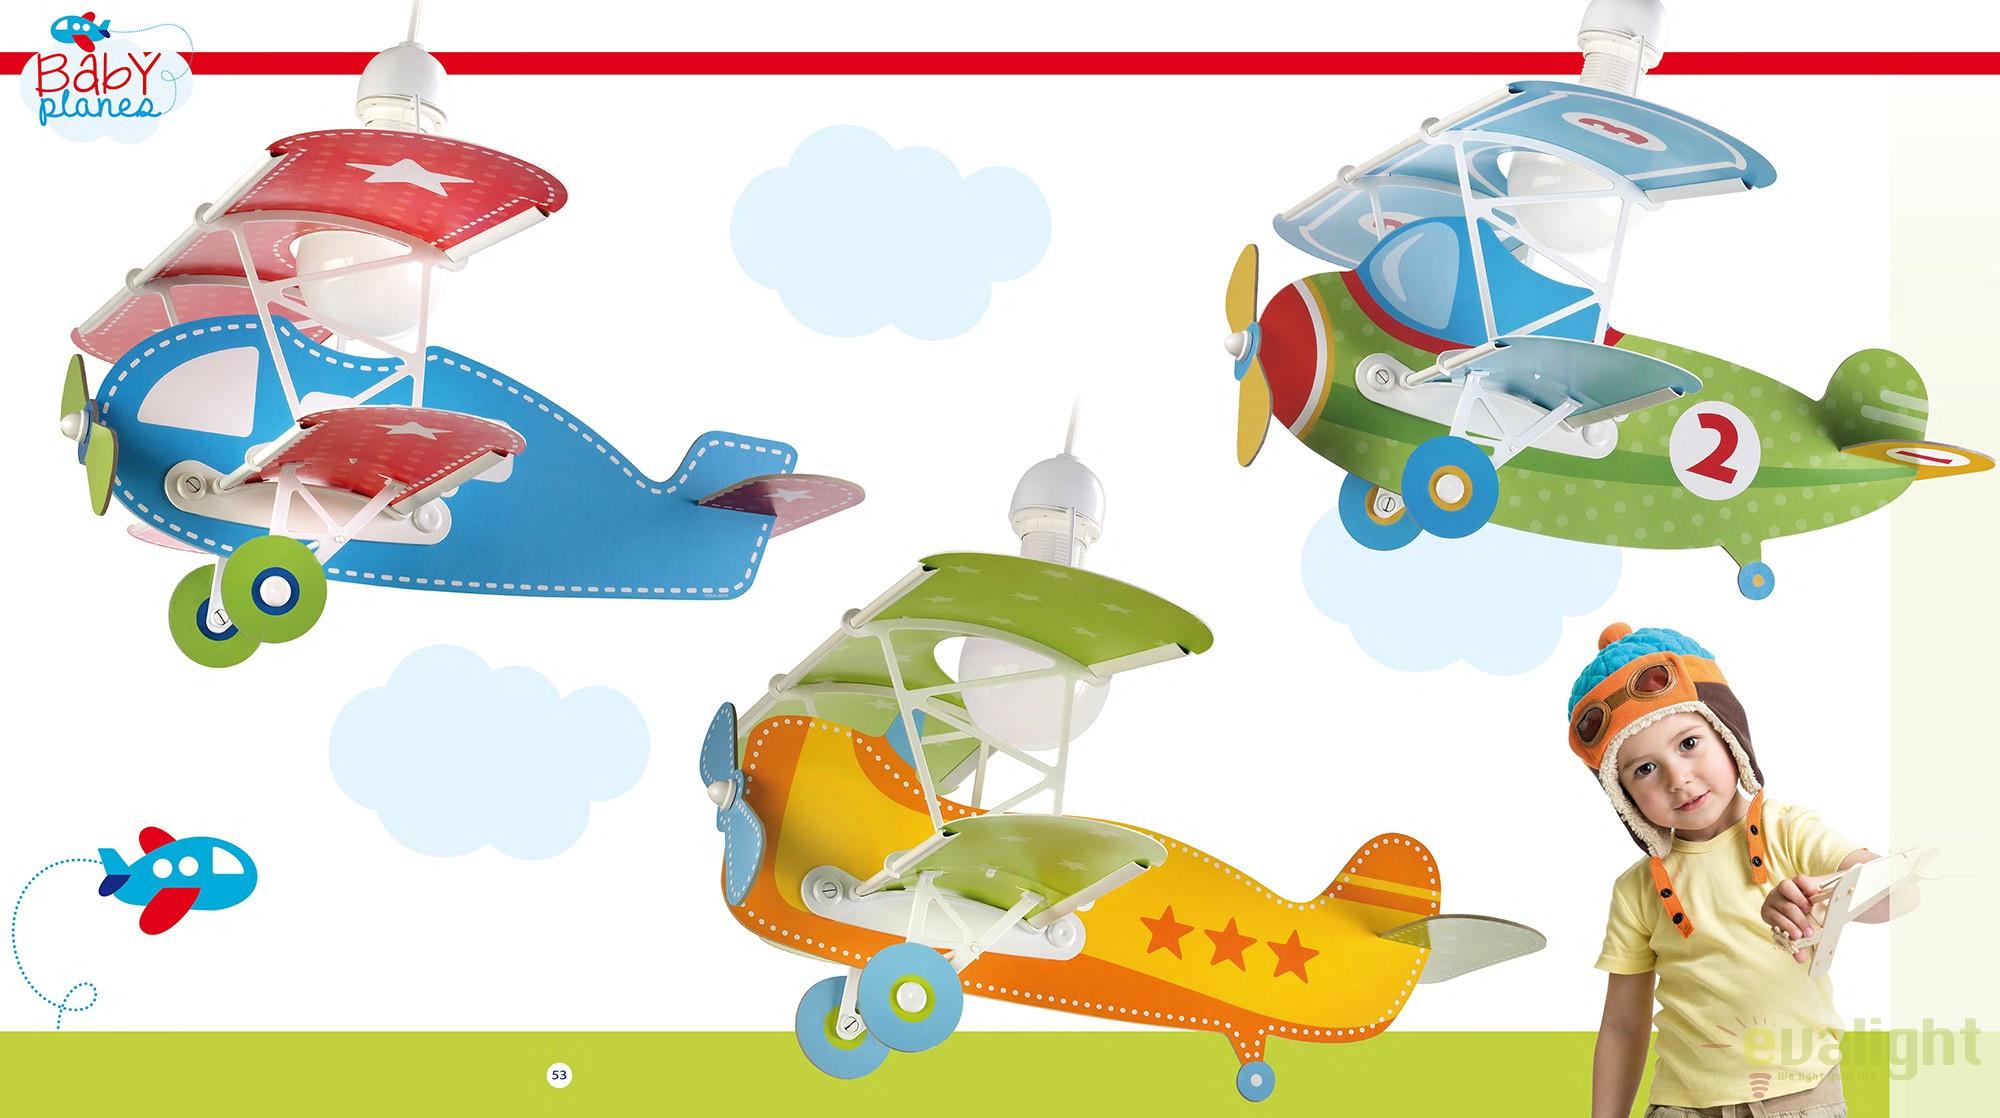 lustra camera copii de dimensiuni mari in forma de avion baby planes albastru 54002 db. Black Bedroom Furniture Sets. Home Design Ideas